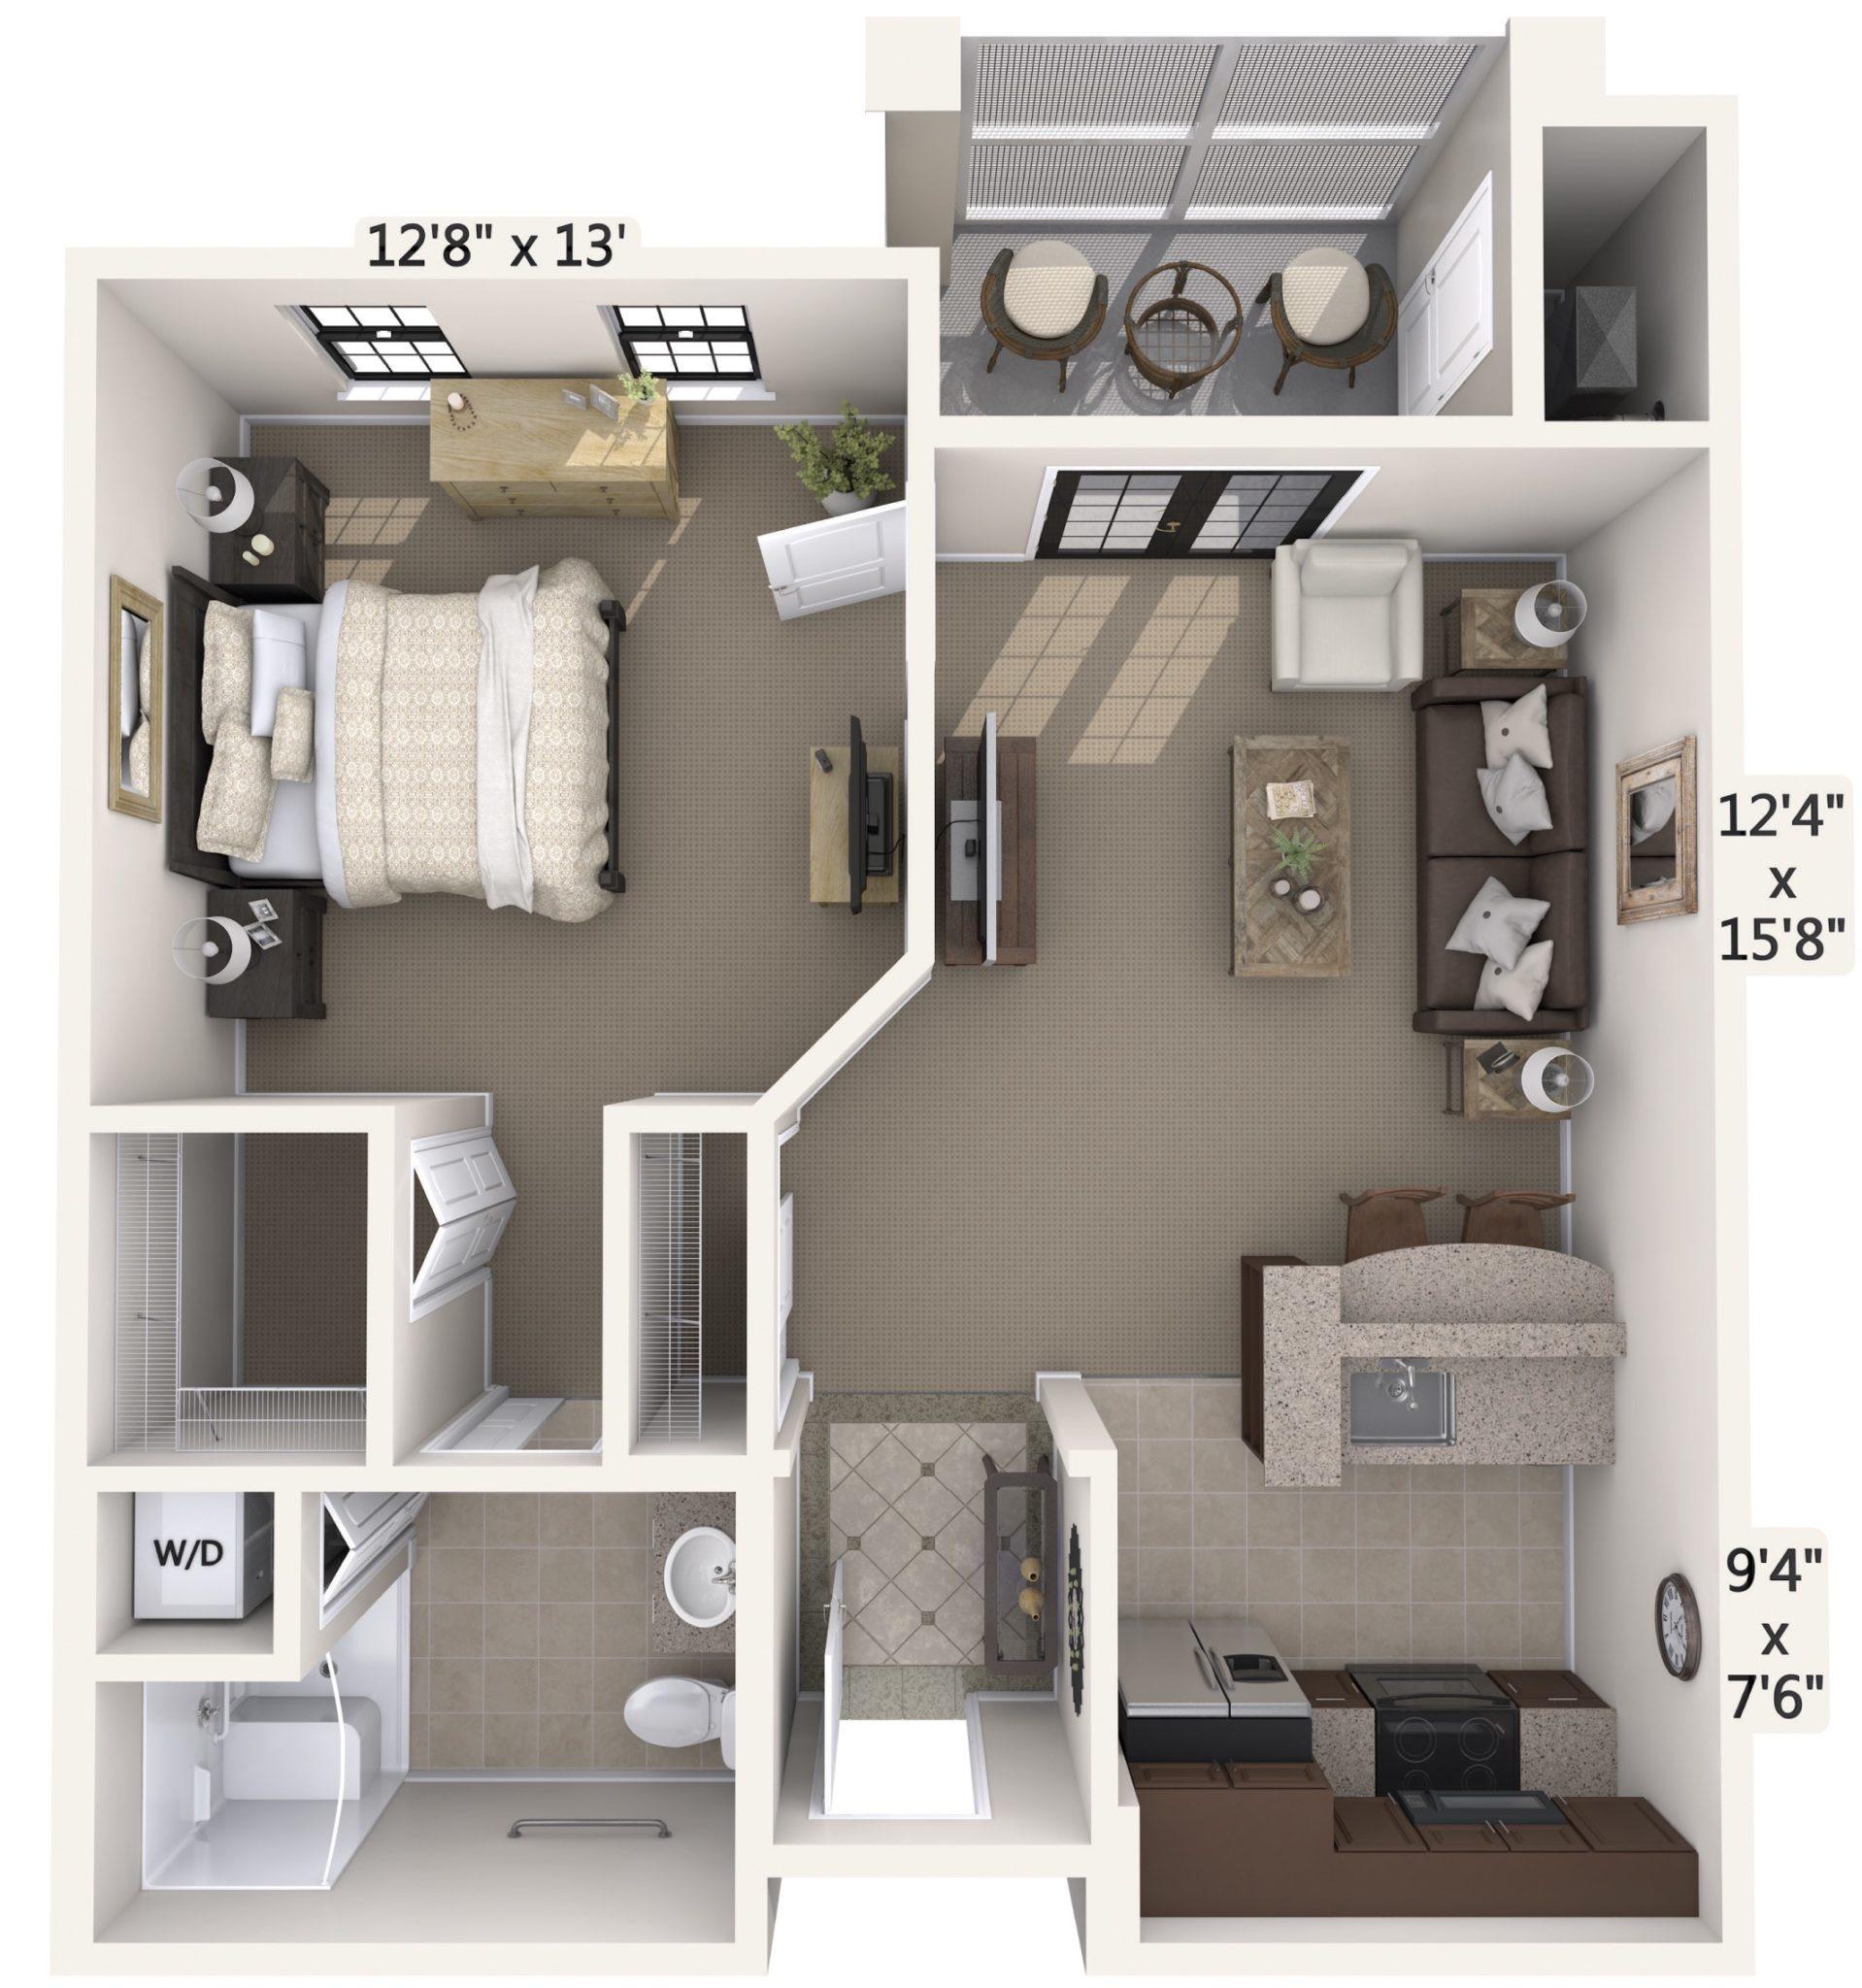 AddingtonPlace_One-Bedroom-Harmony_715-sq.-ft._IL_Jupiter-1918x2048